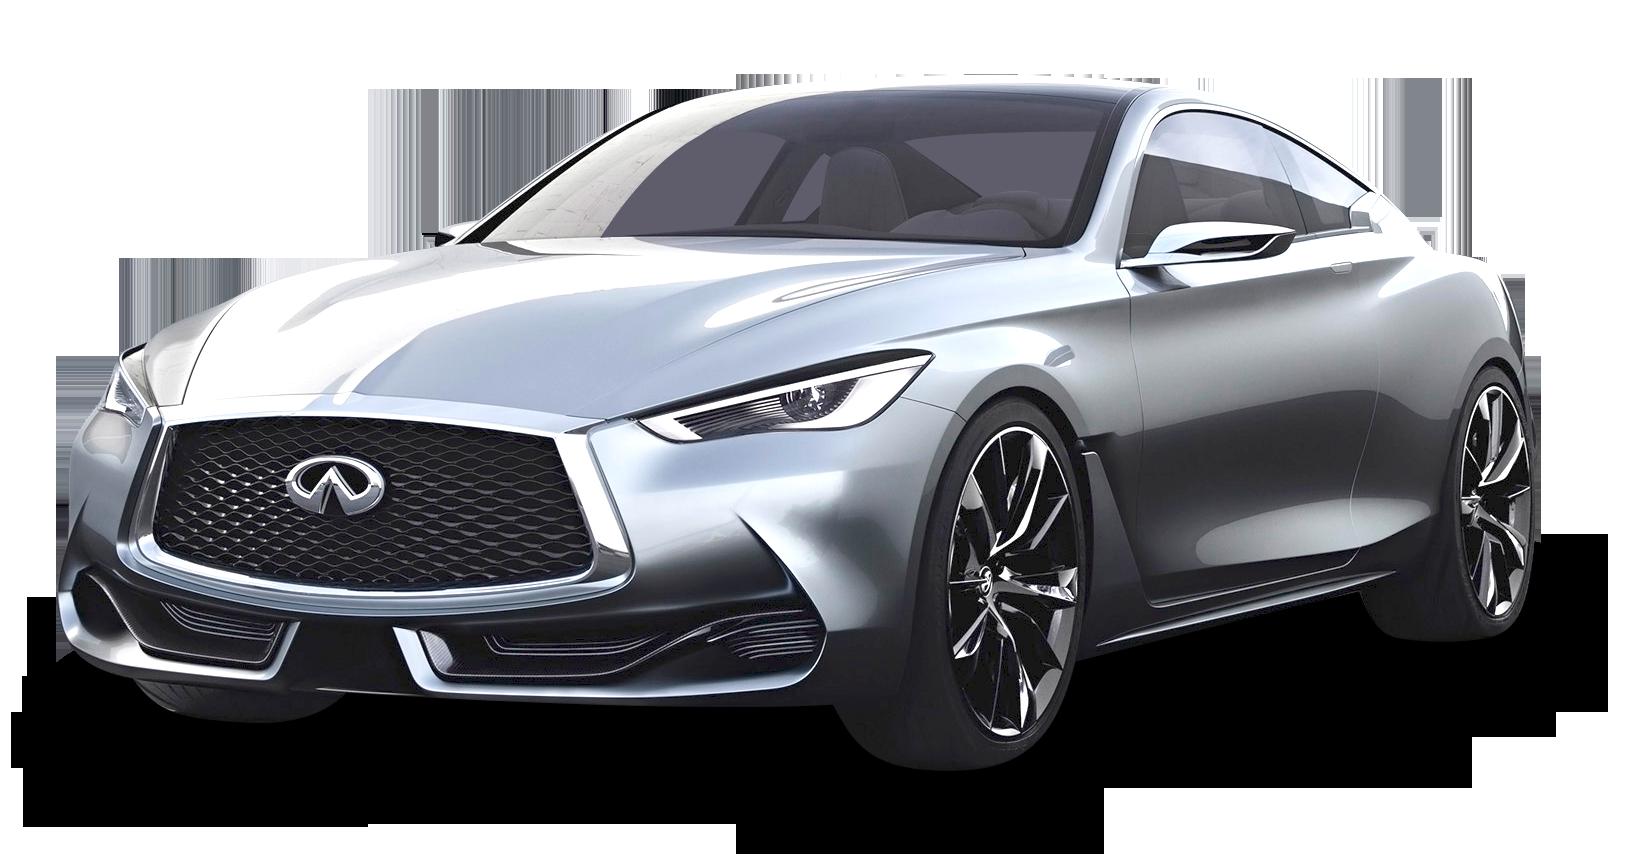 Silver Infiniti Q60 Luxury Car Png Image Luxury Cars Car Fancy Cars